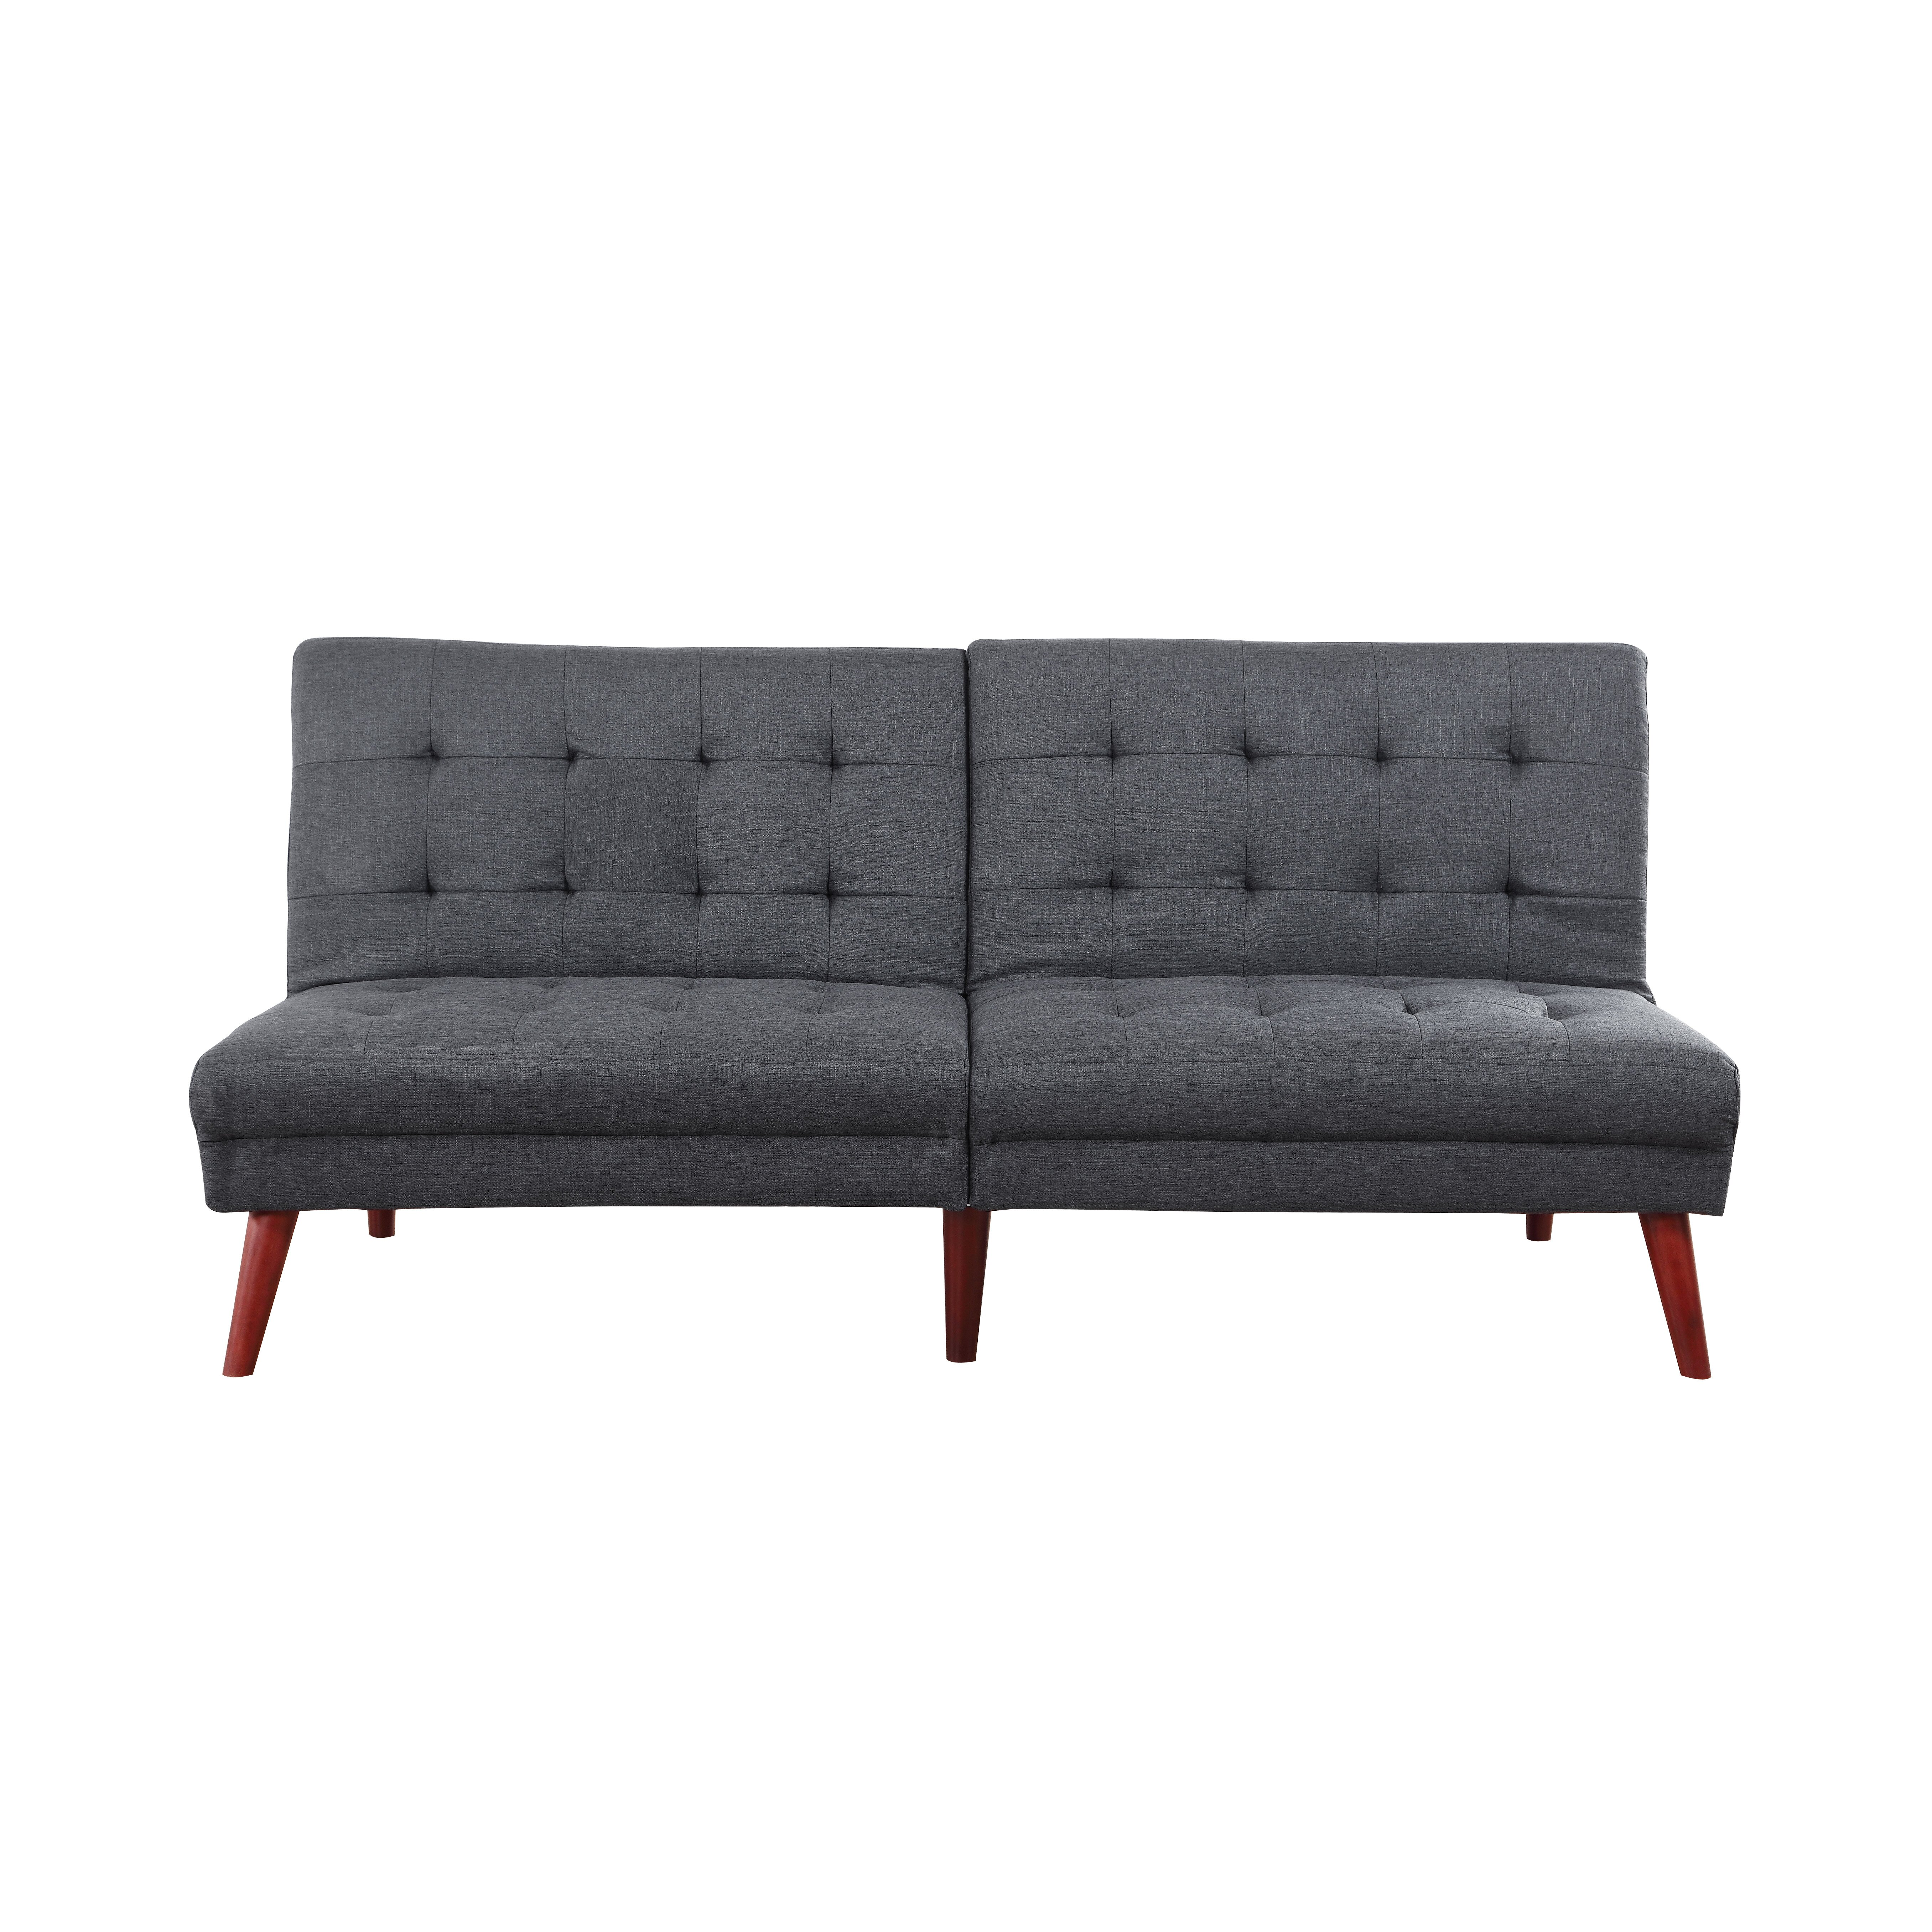 madison home usa modern tufted convertible sofa reviews wayf